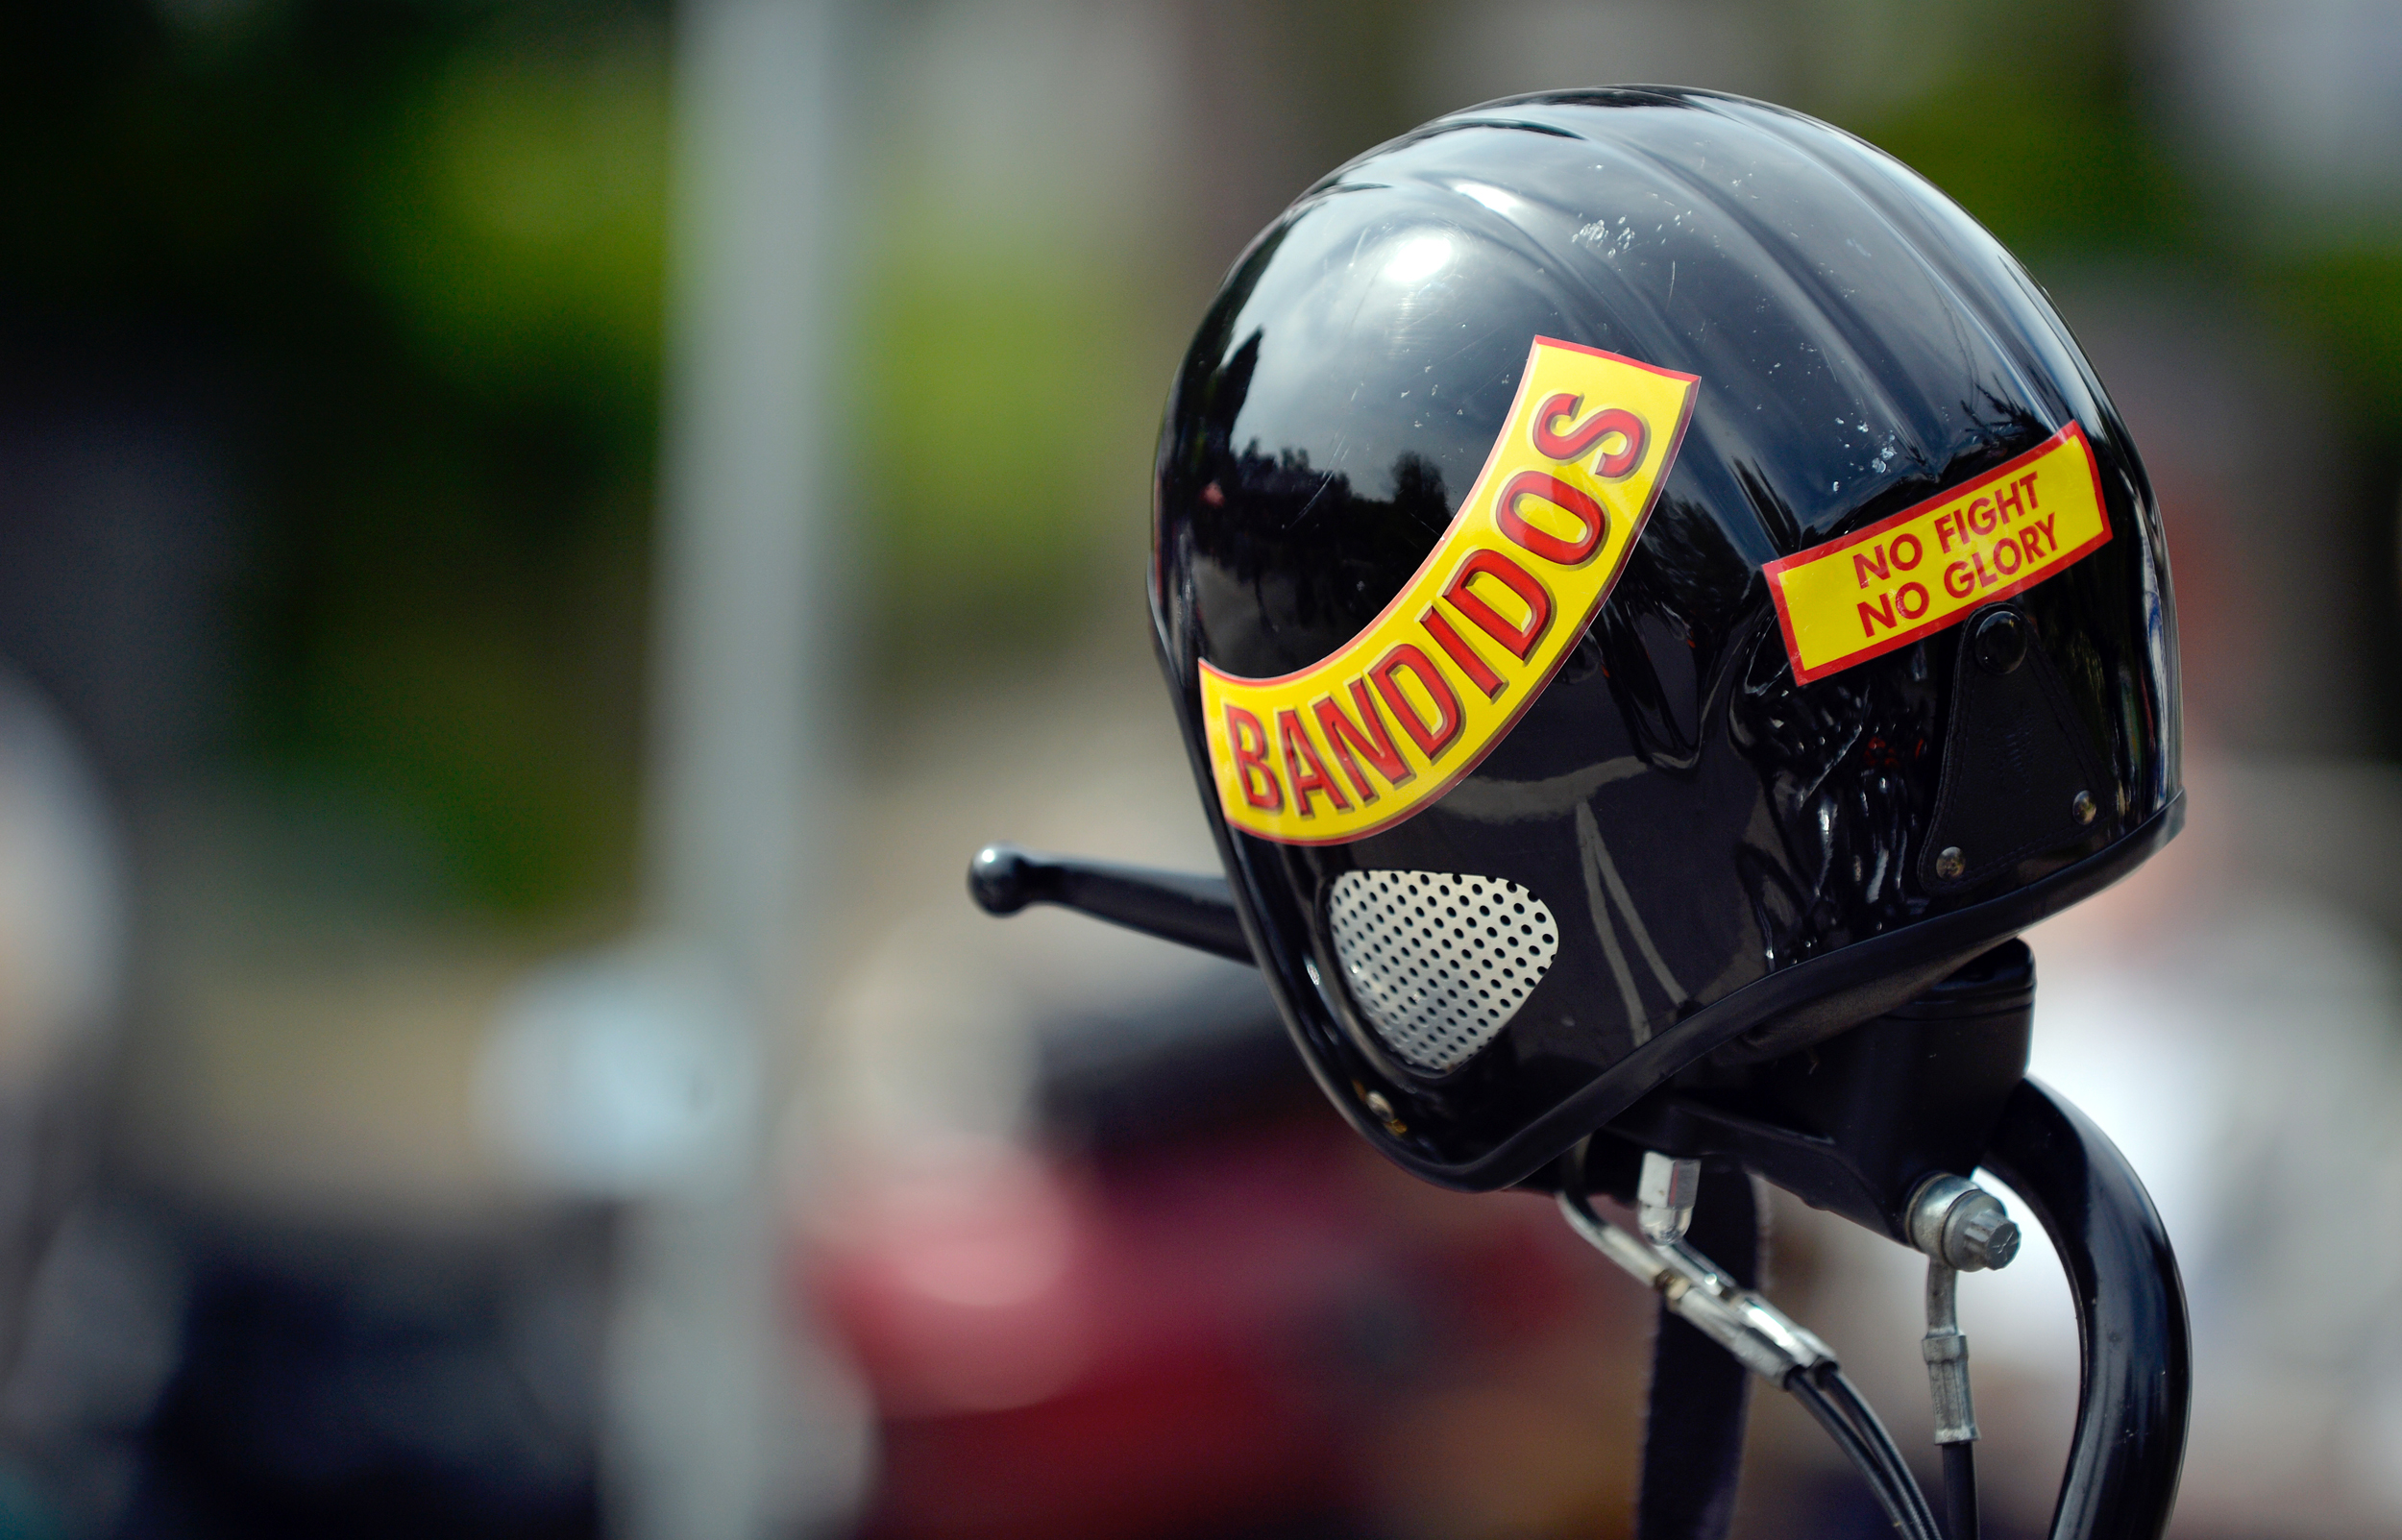 Waco Biker Brawl: Bandidos Are 'Baddest of the Bad,' Expert Says